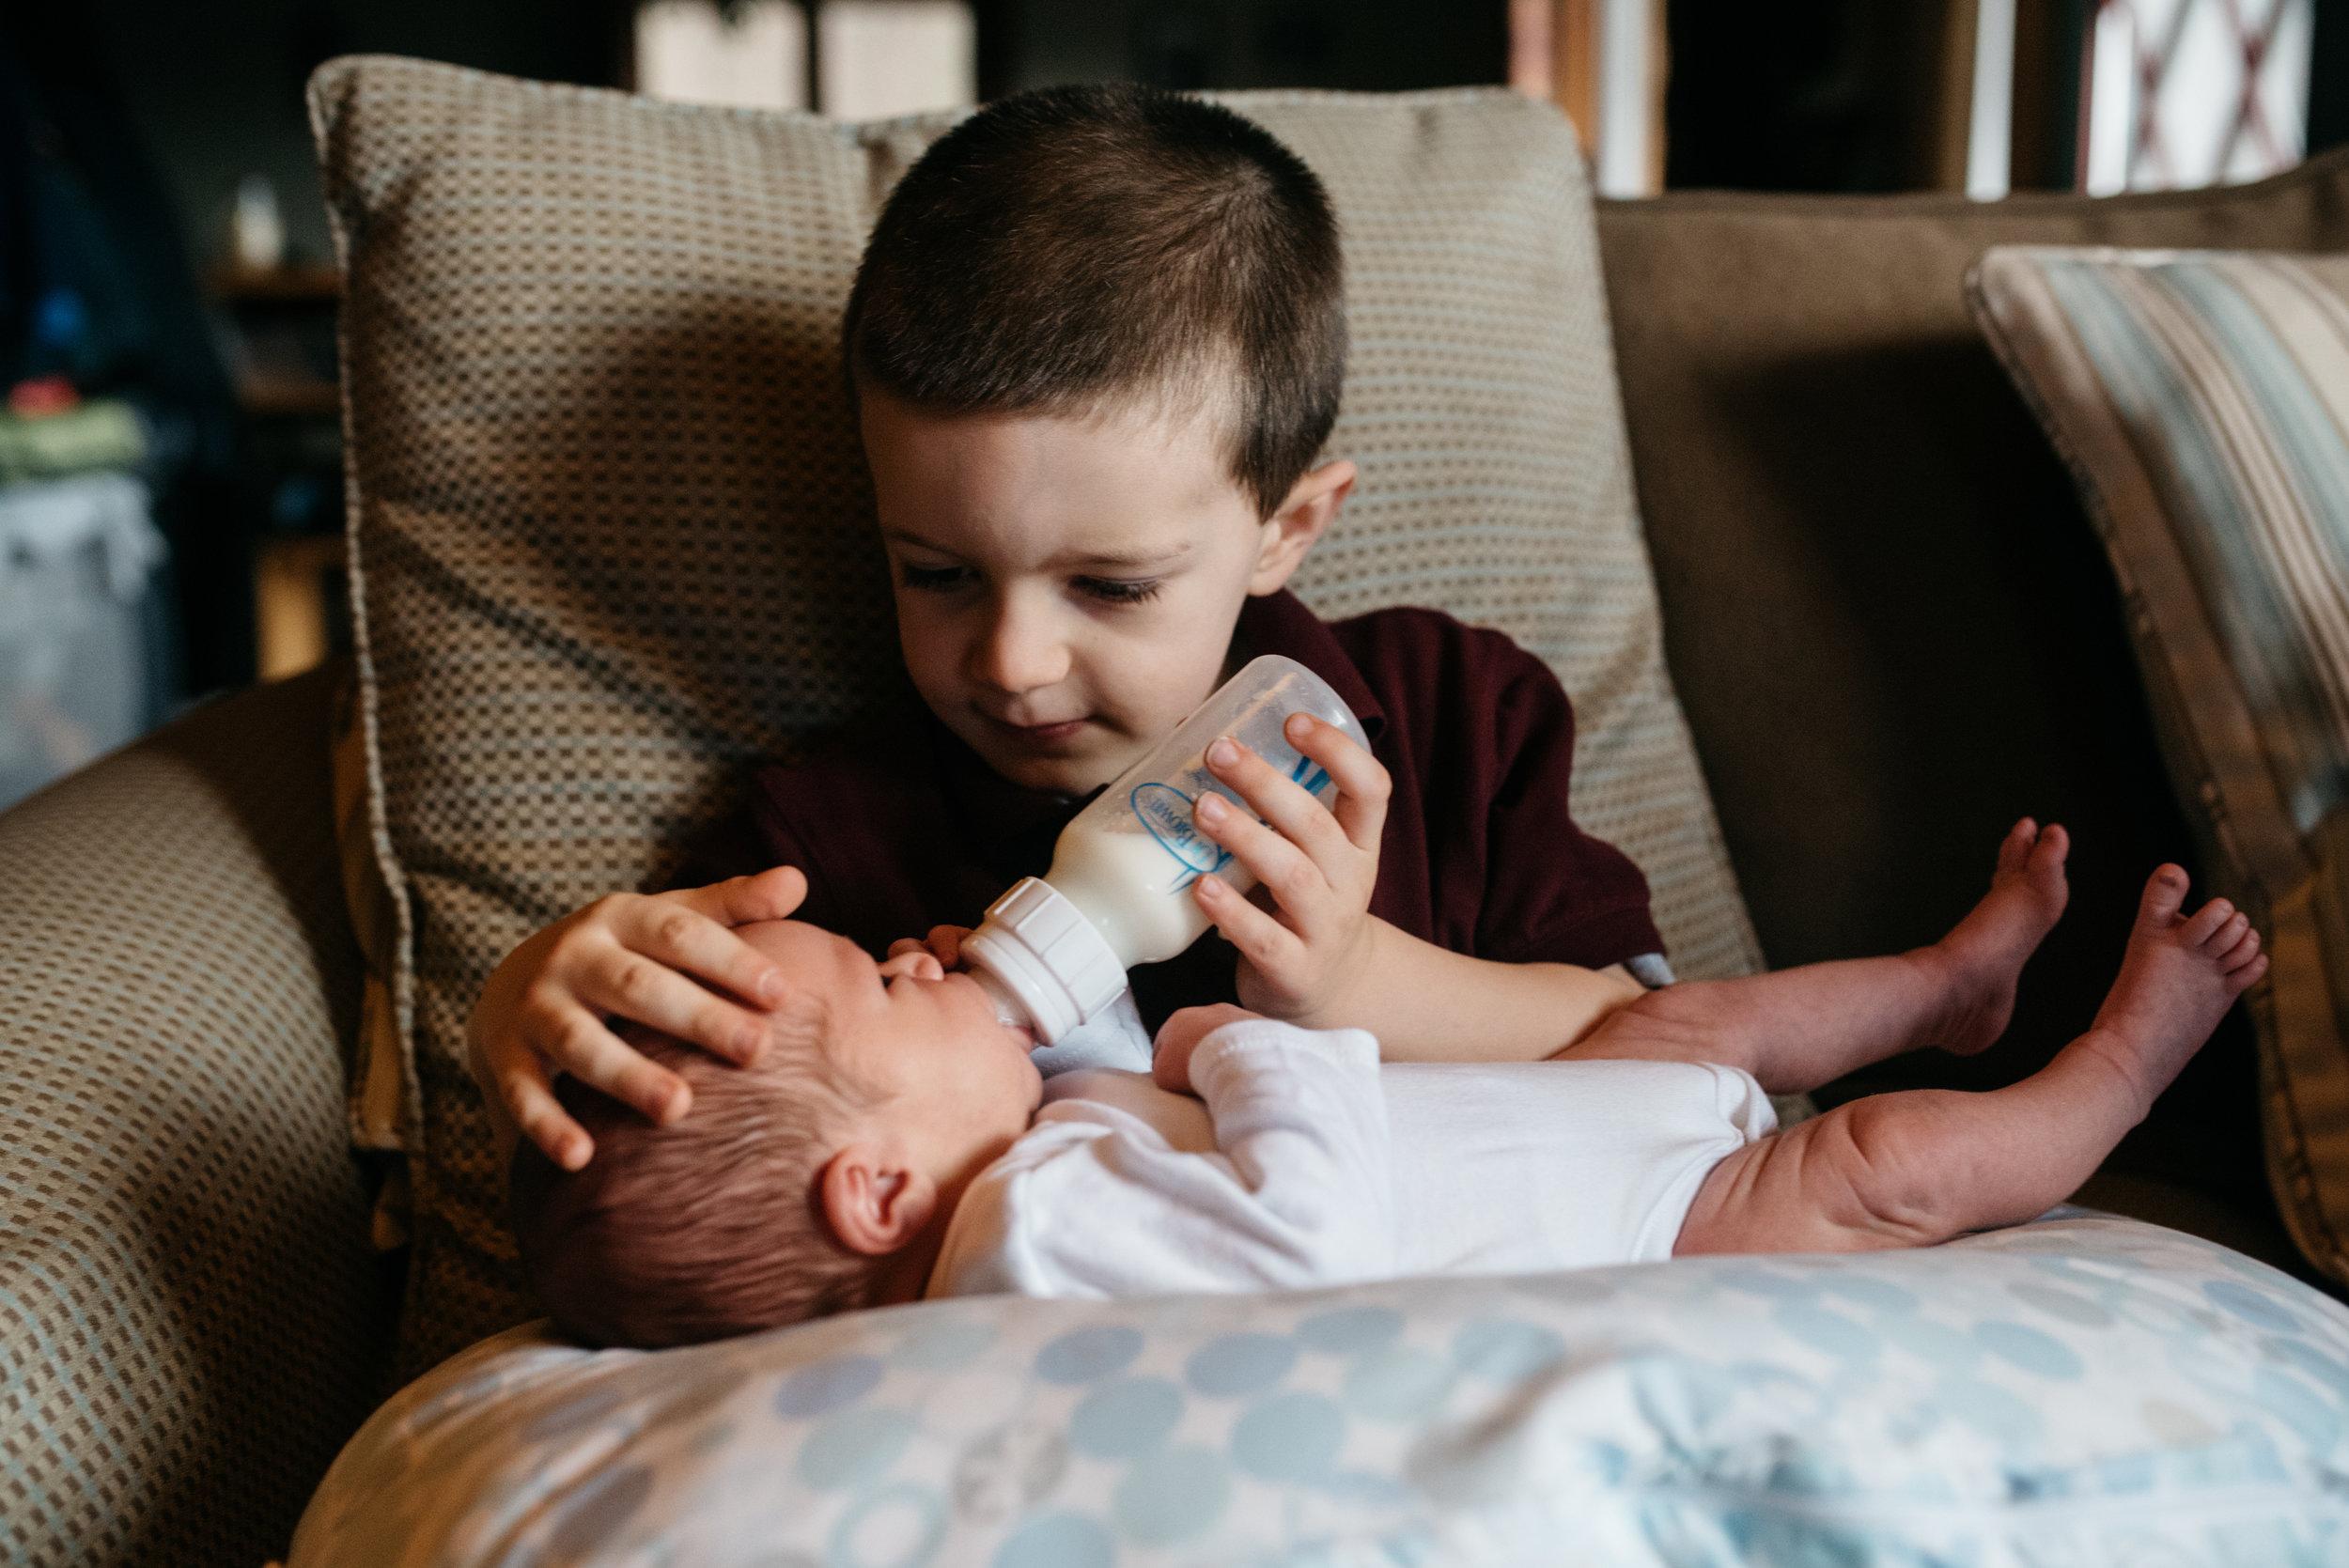 Brother feeding newborn brother lifestyle photographs